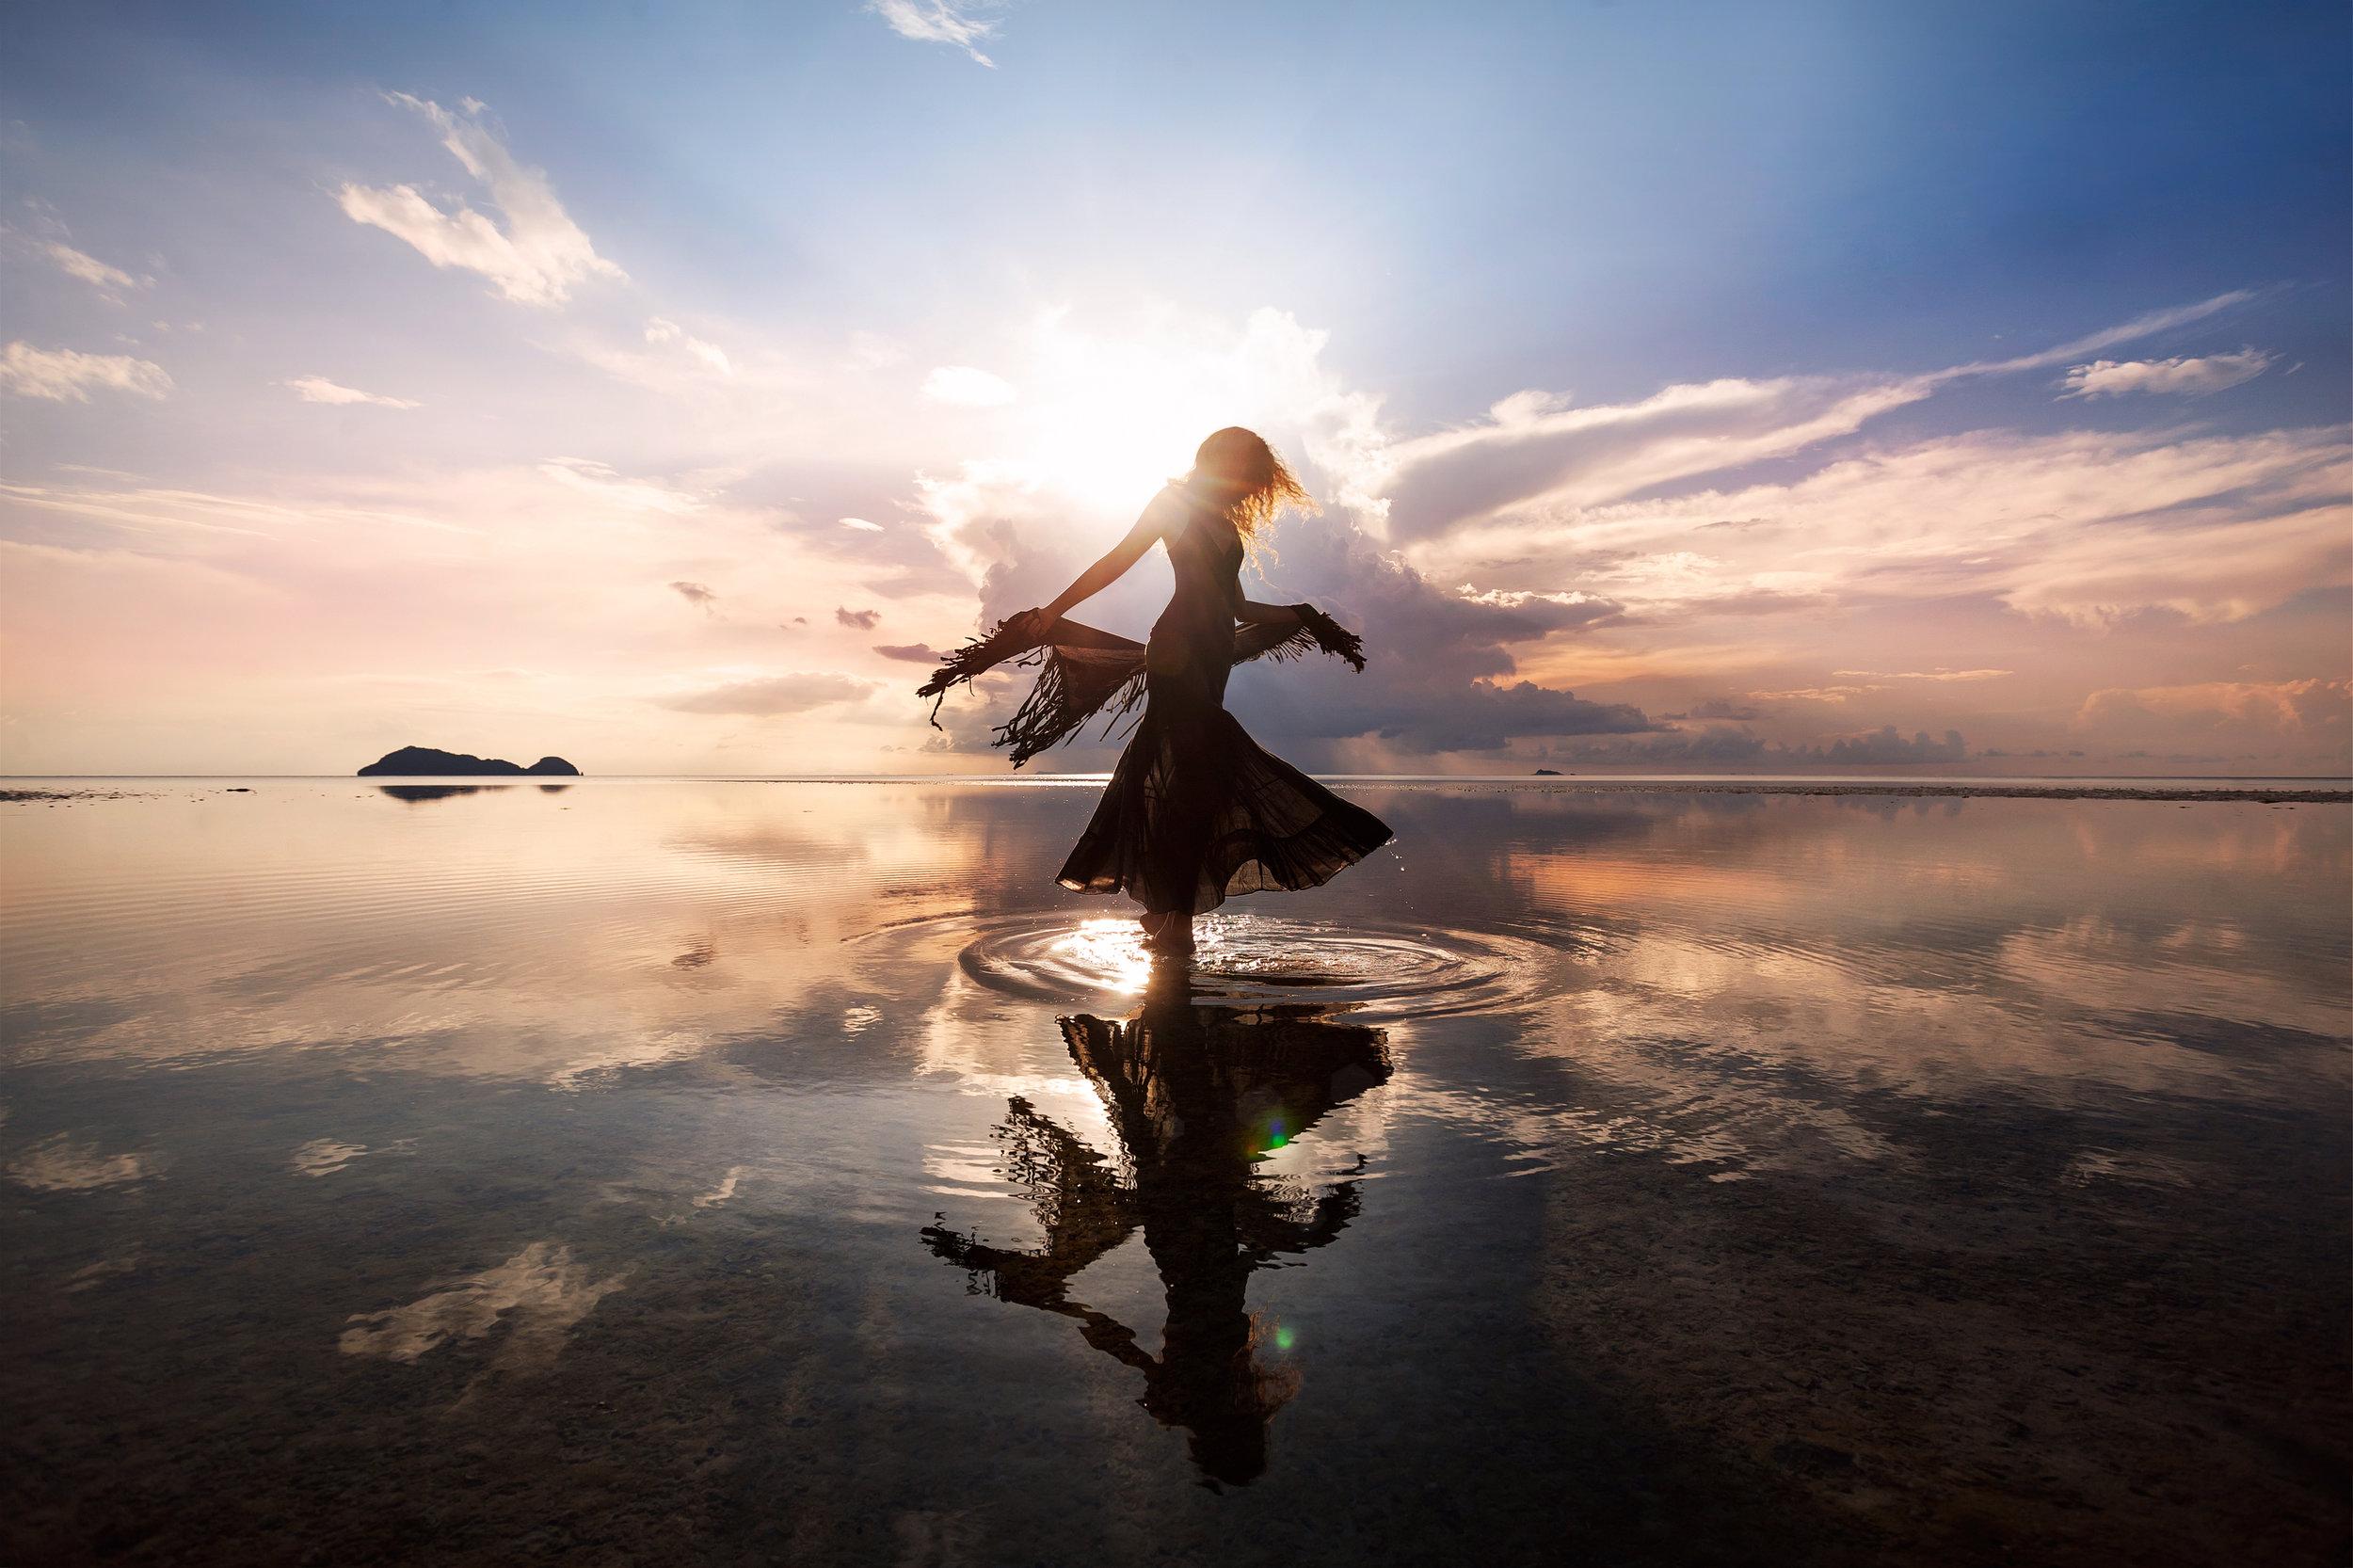 She is illumination -